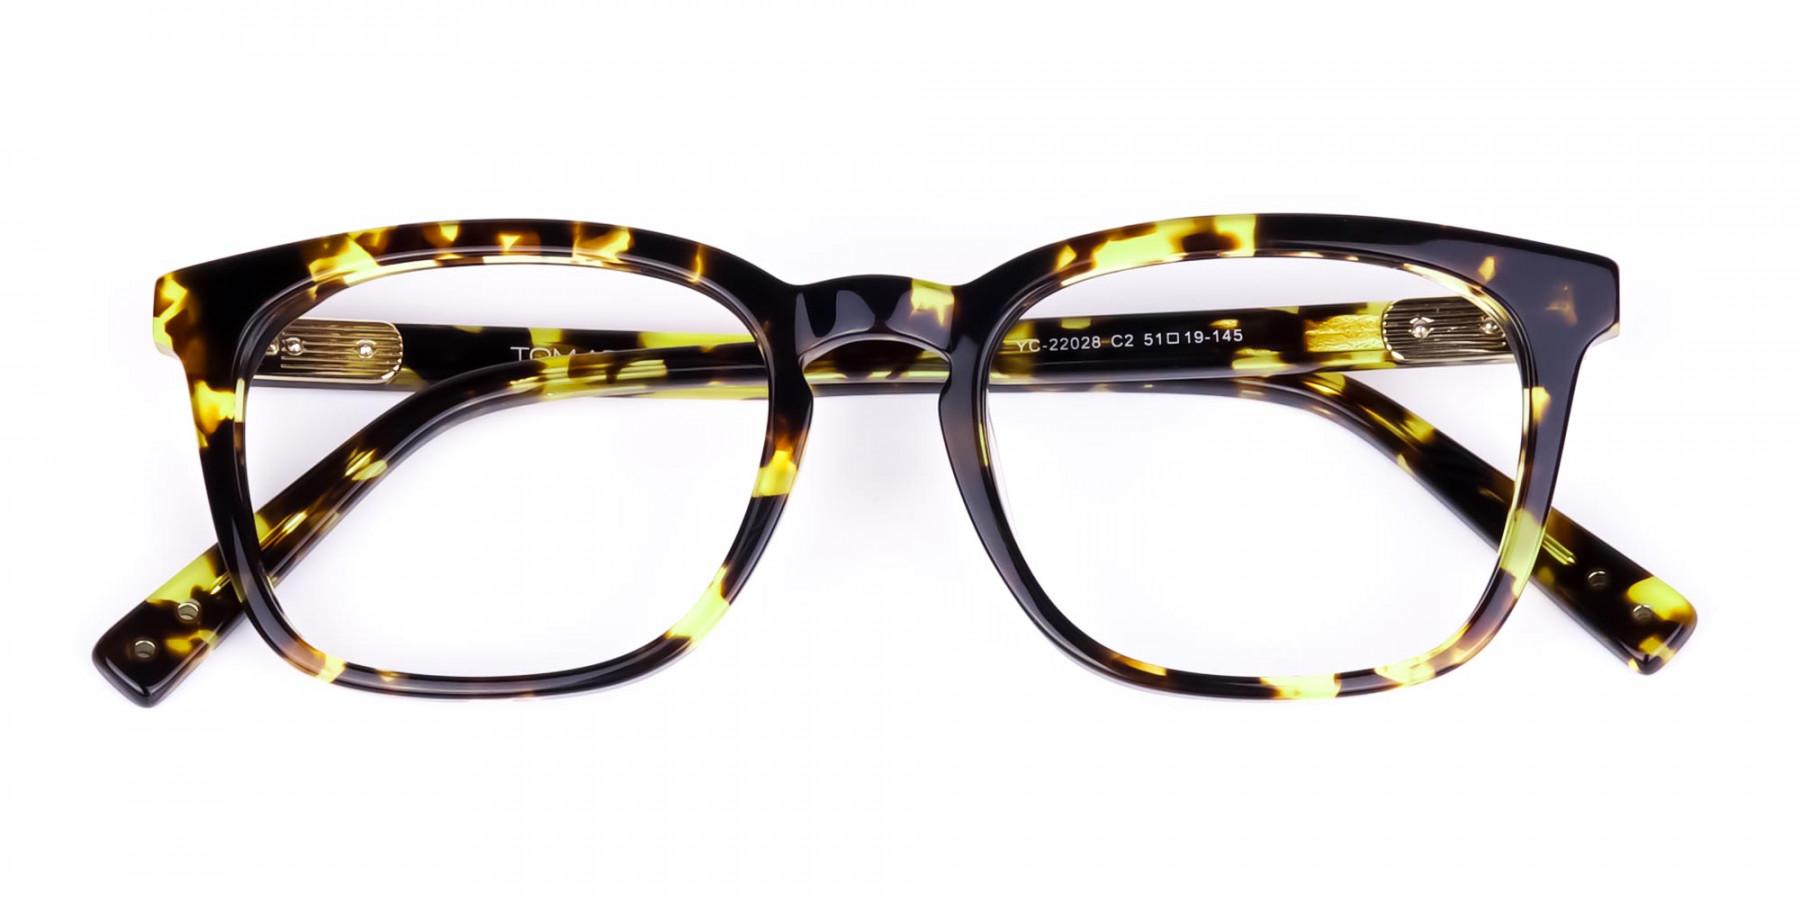 Tortoise-Brown-Wayfarer-Glasses-1